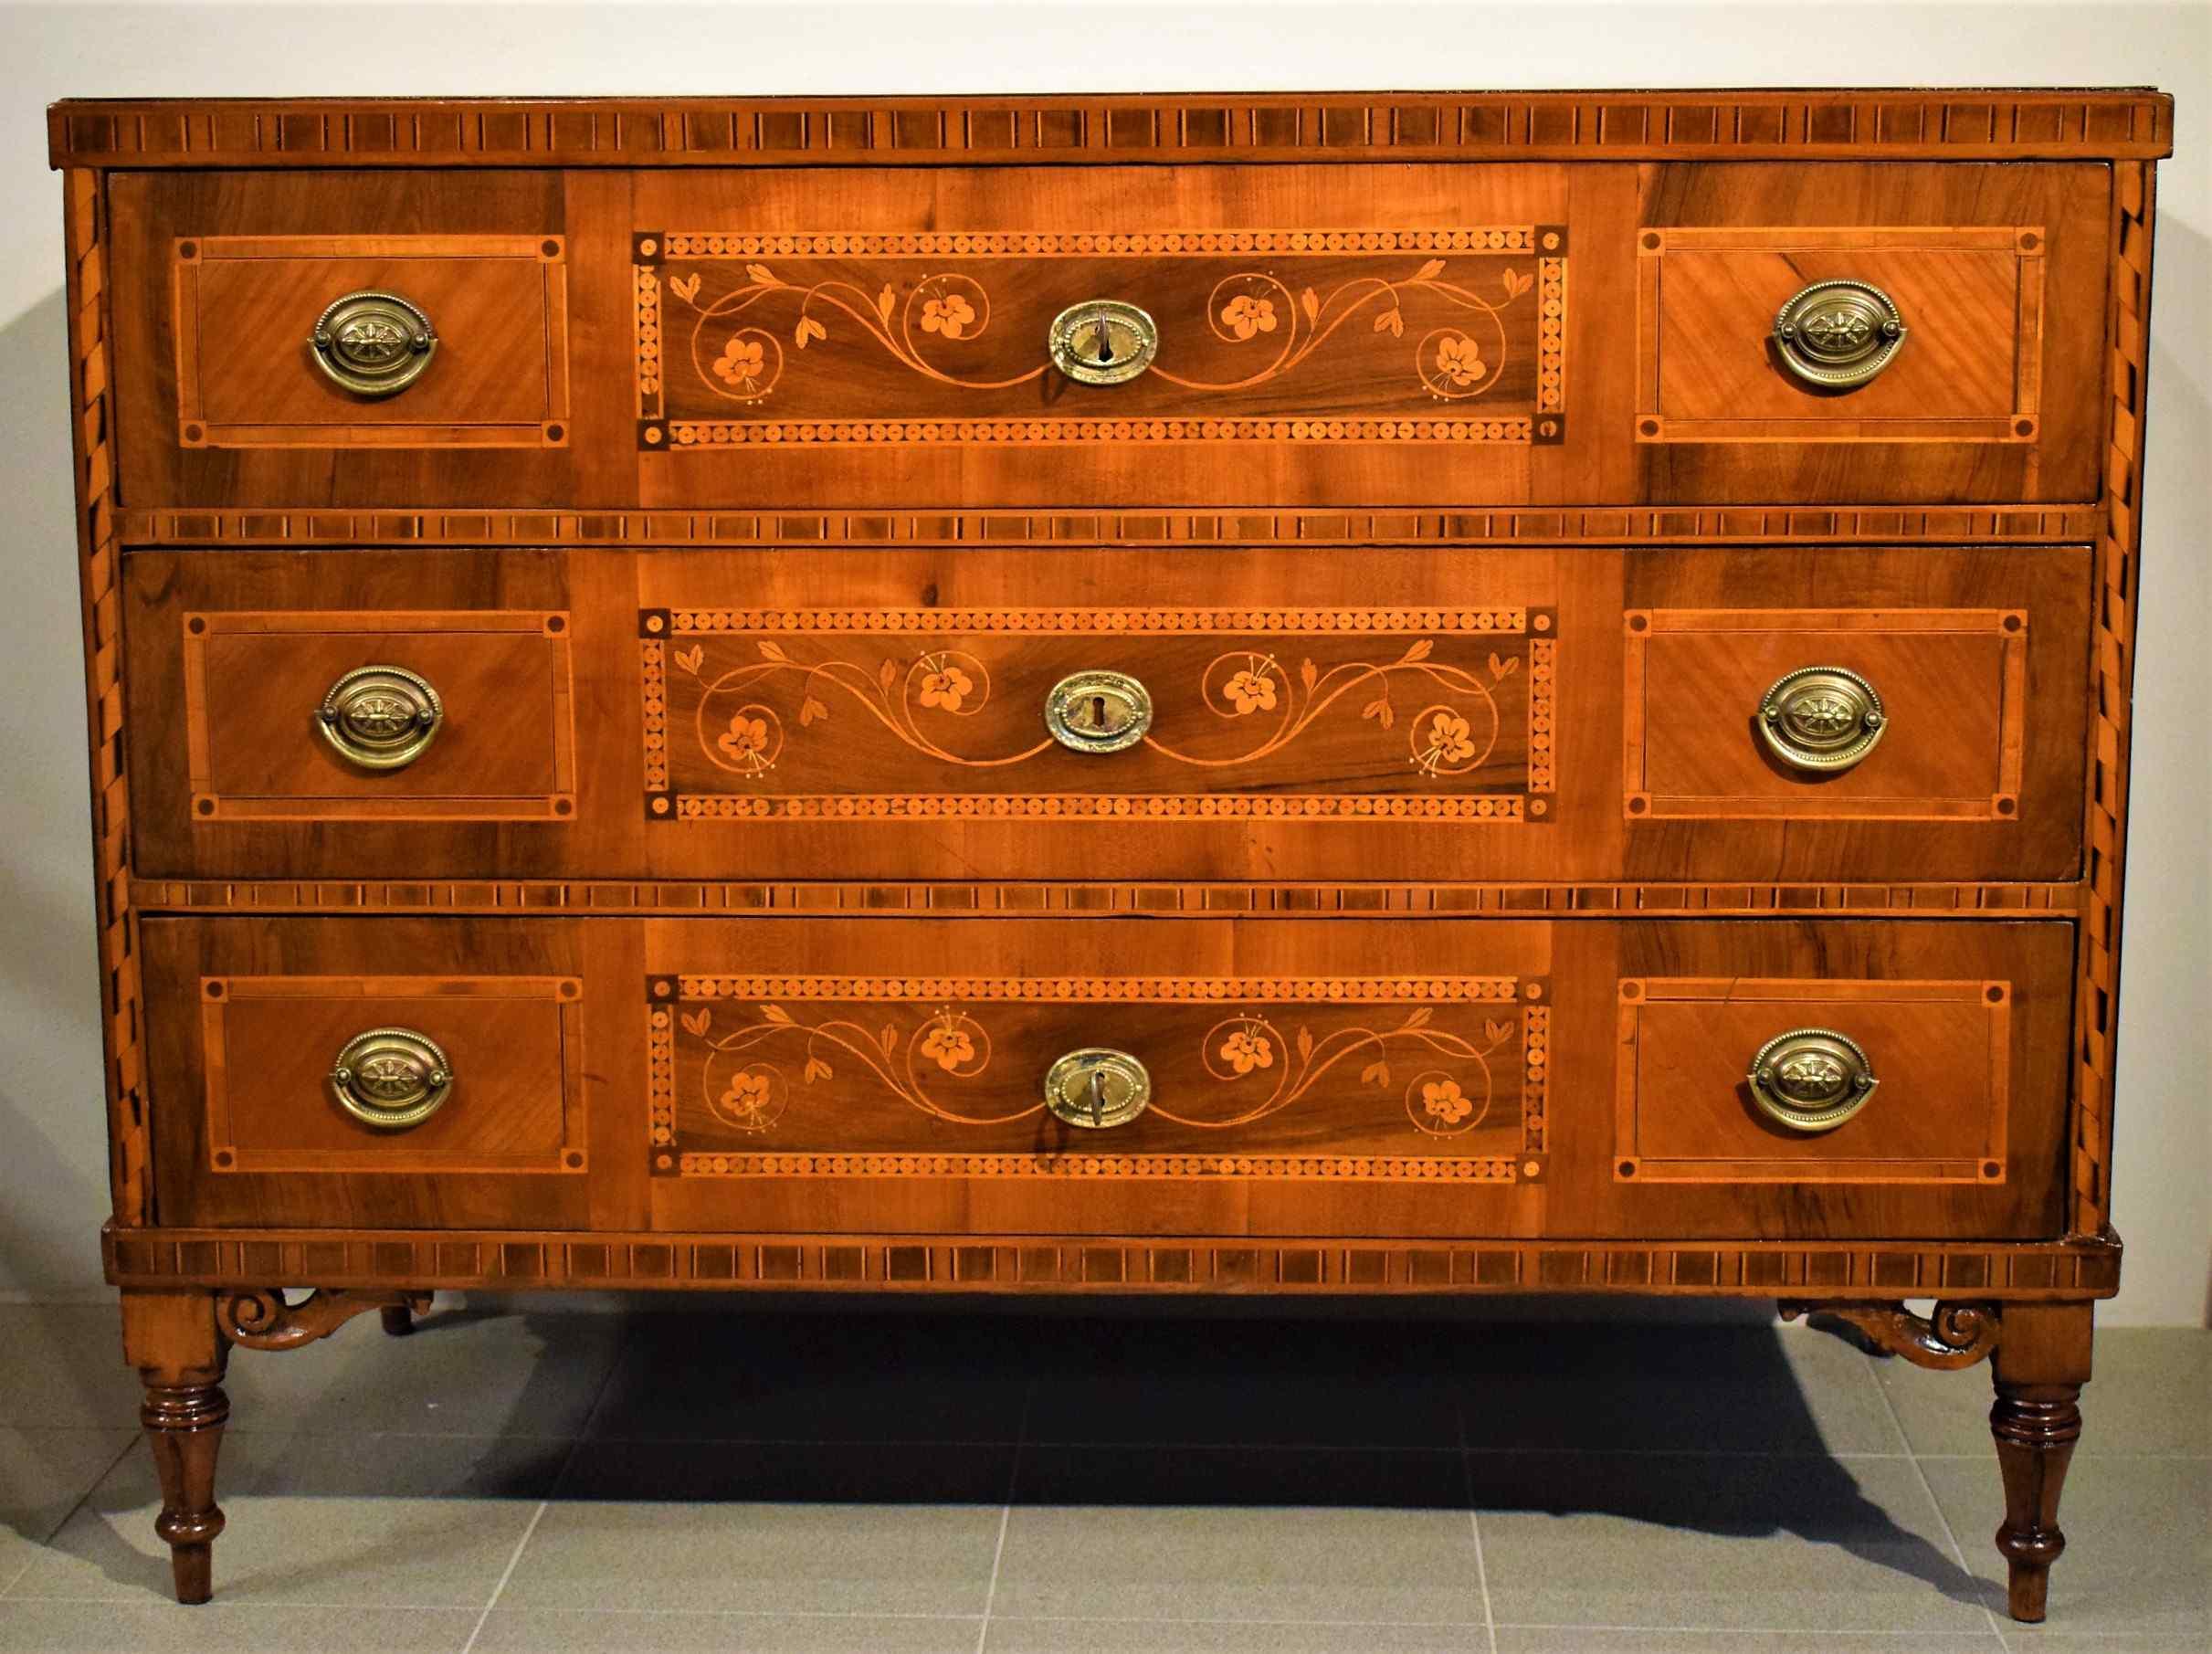 Louis XVI chest of drawers City of TrentoLo